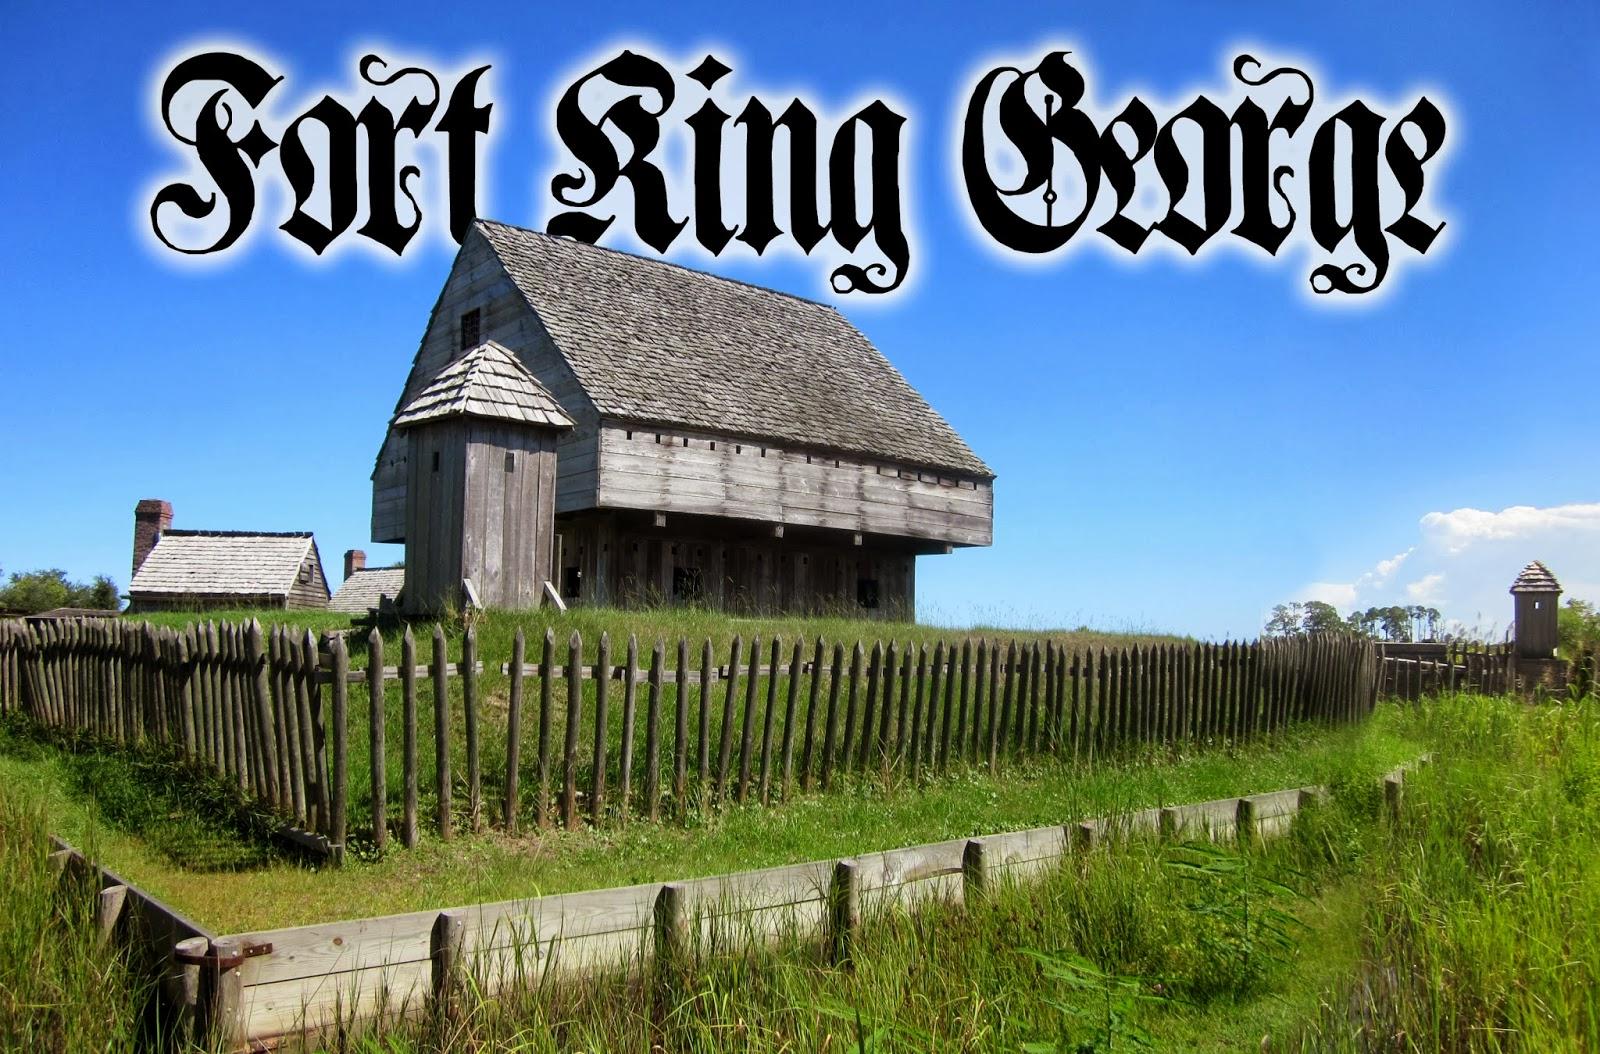 Battleground Hobbies: Black Powder Era Fort King George: For your